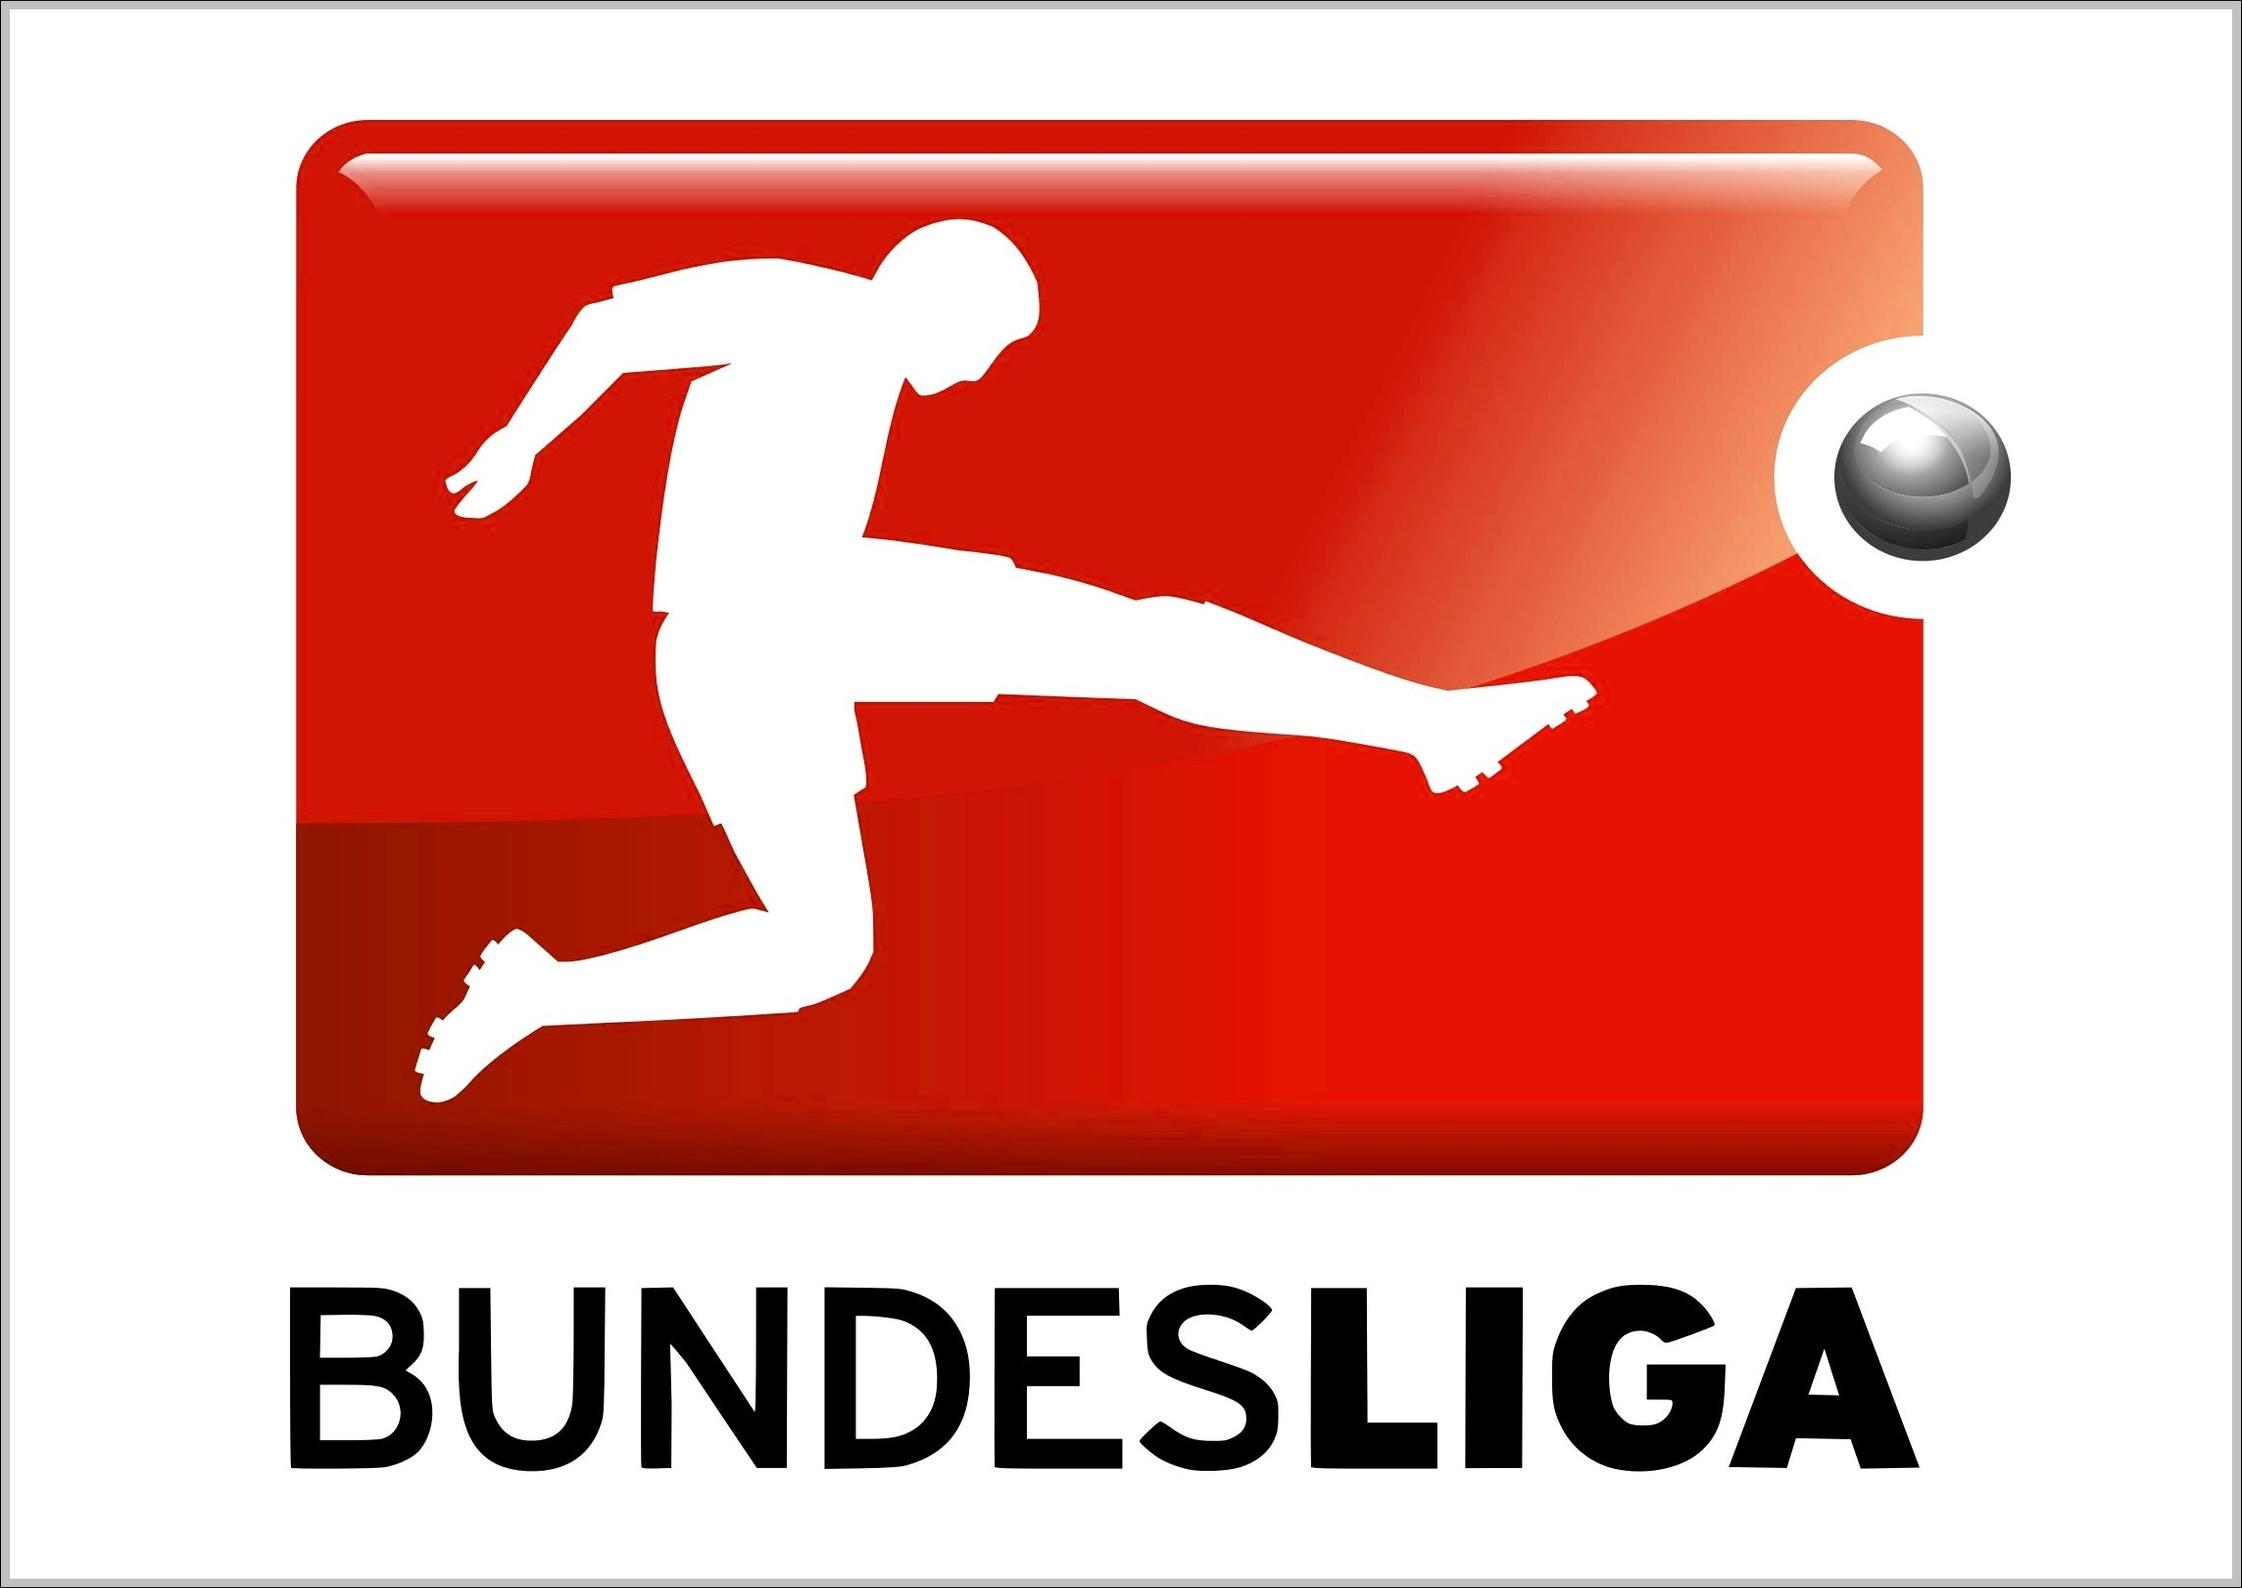 Bundesliga logo 2010 logo sign logos signs symbols for Bundesliga 2010